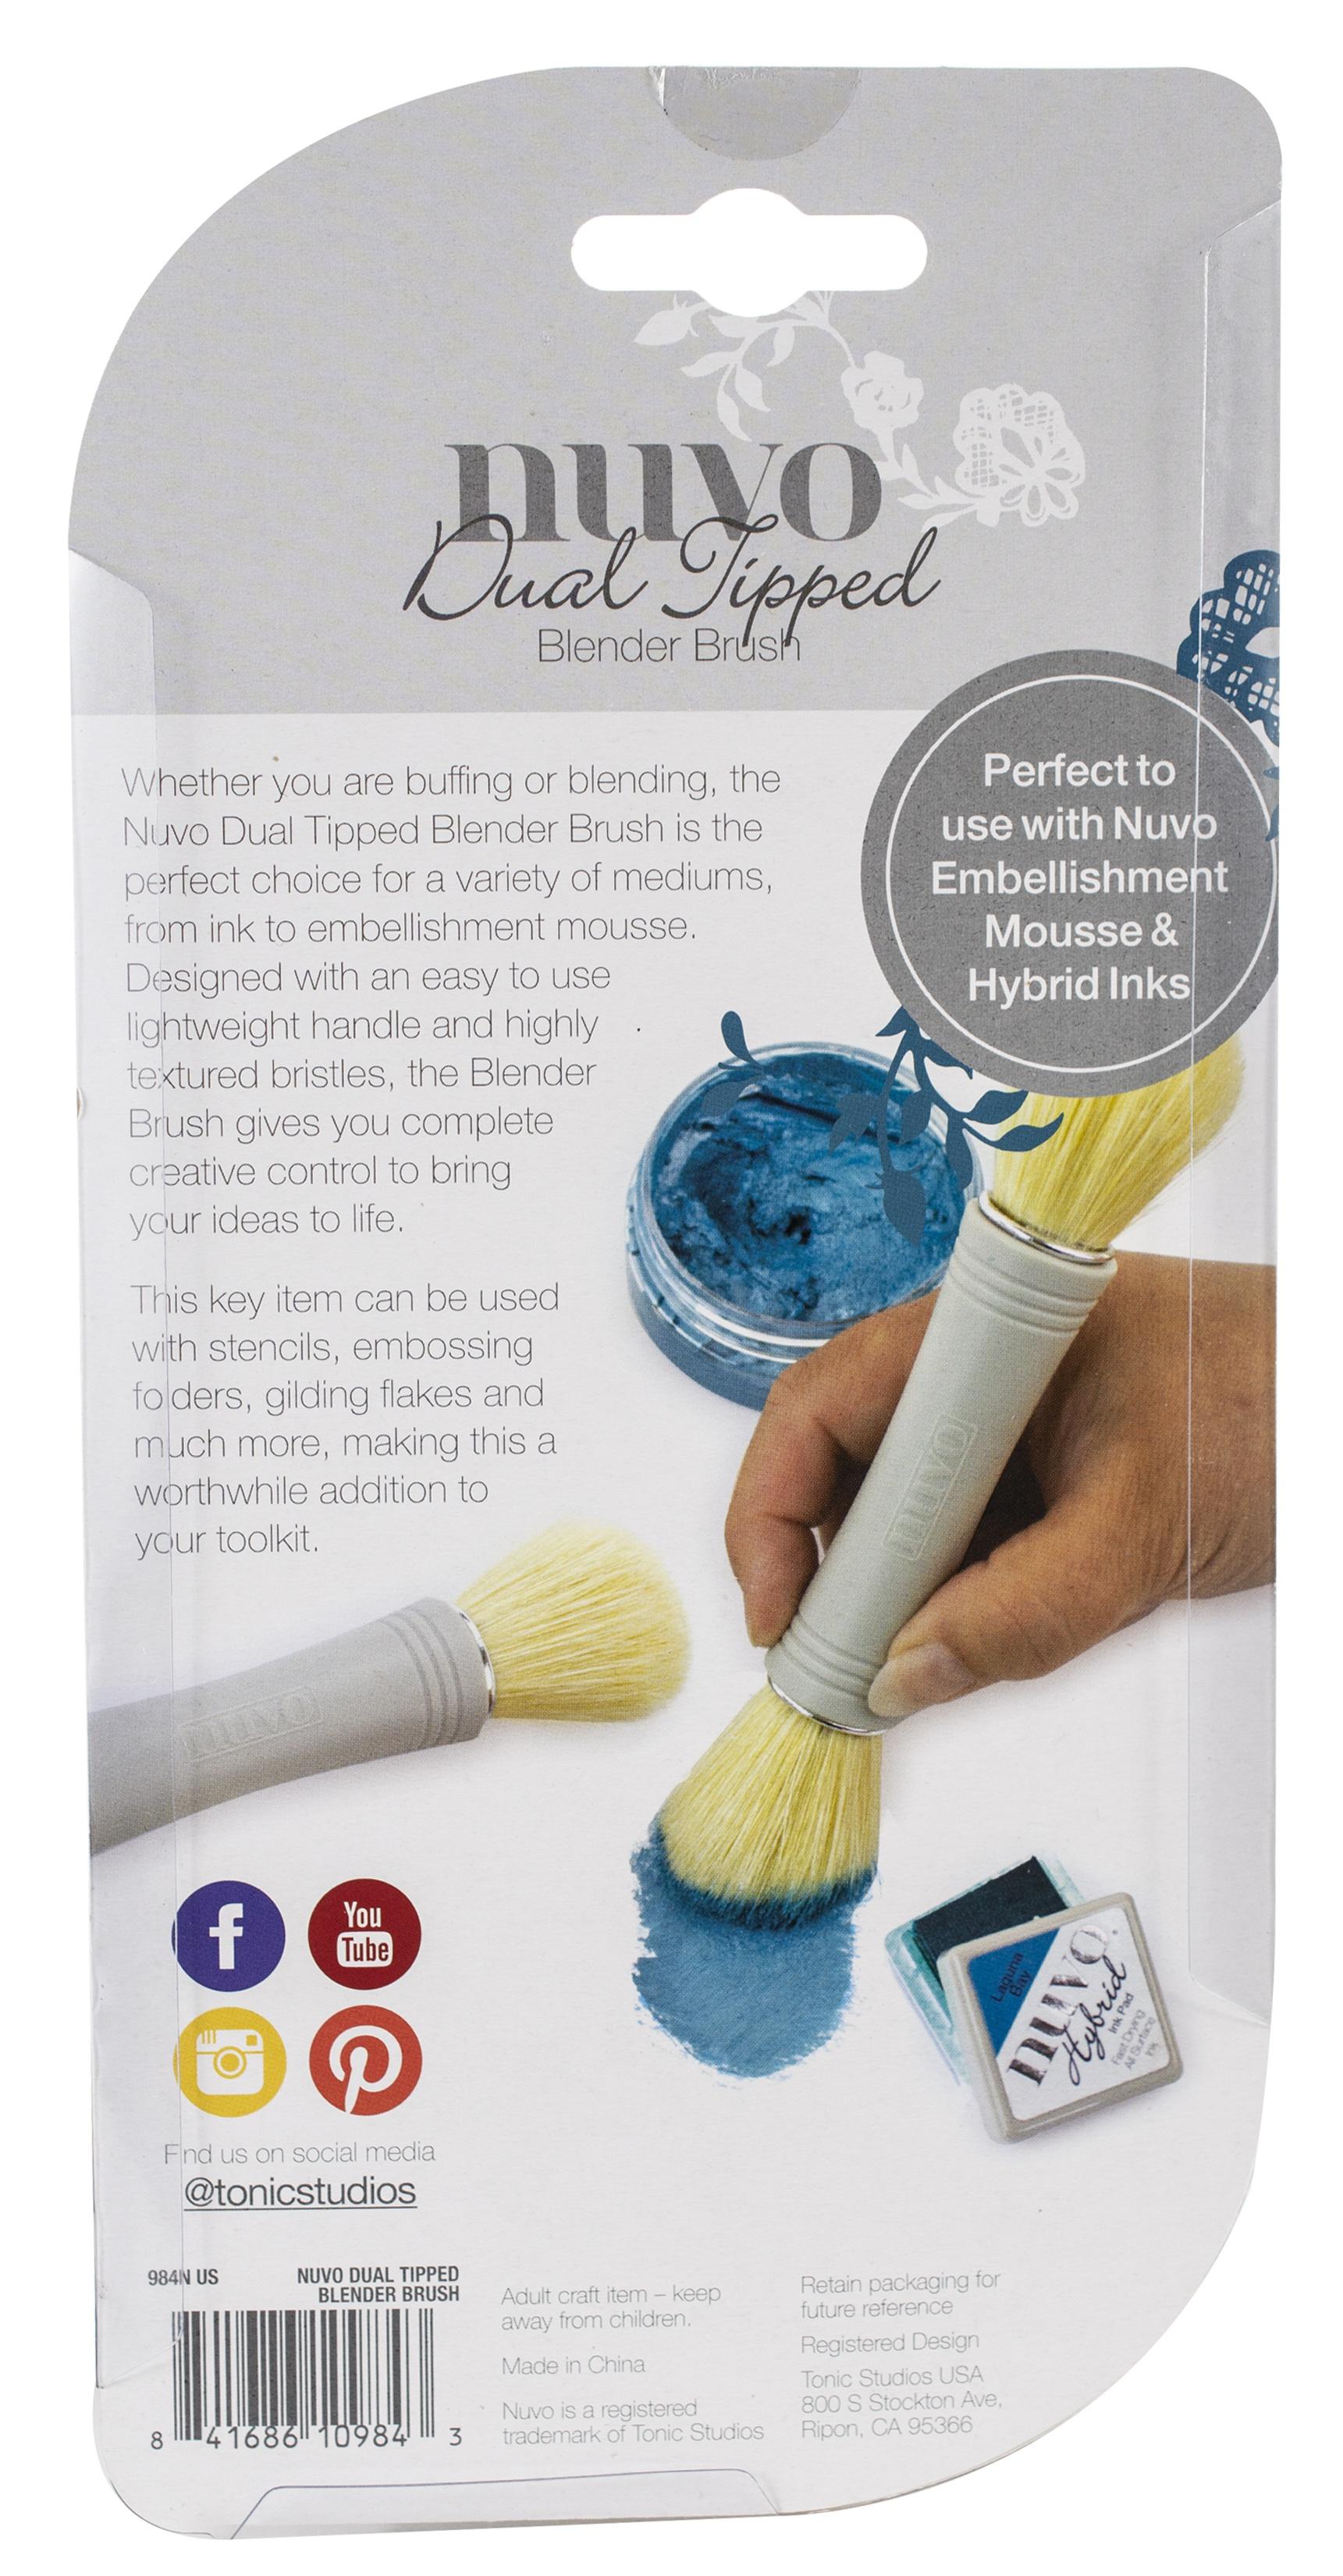 Dual Tipped Blender Brush